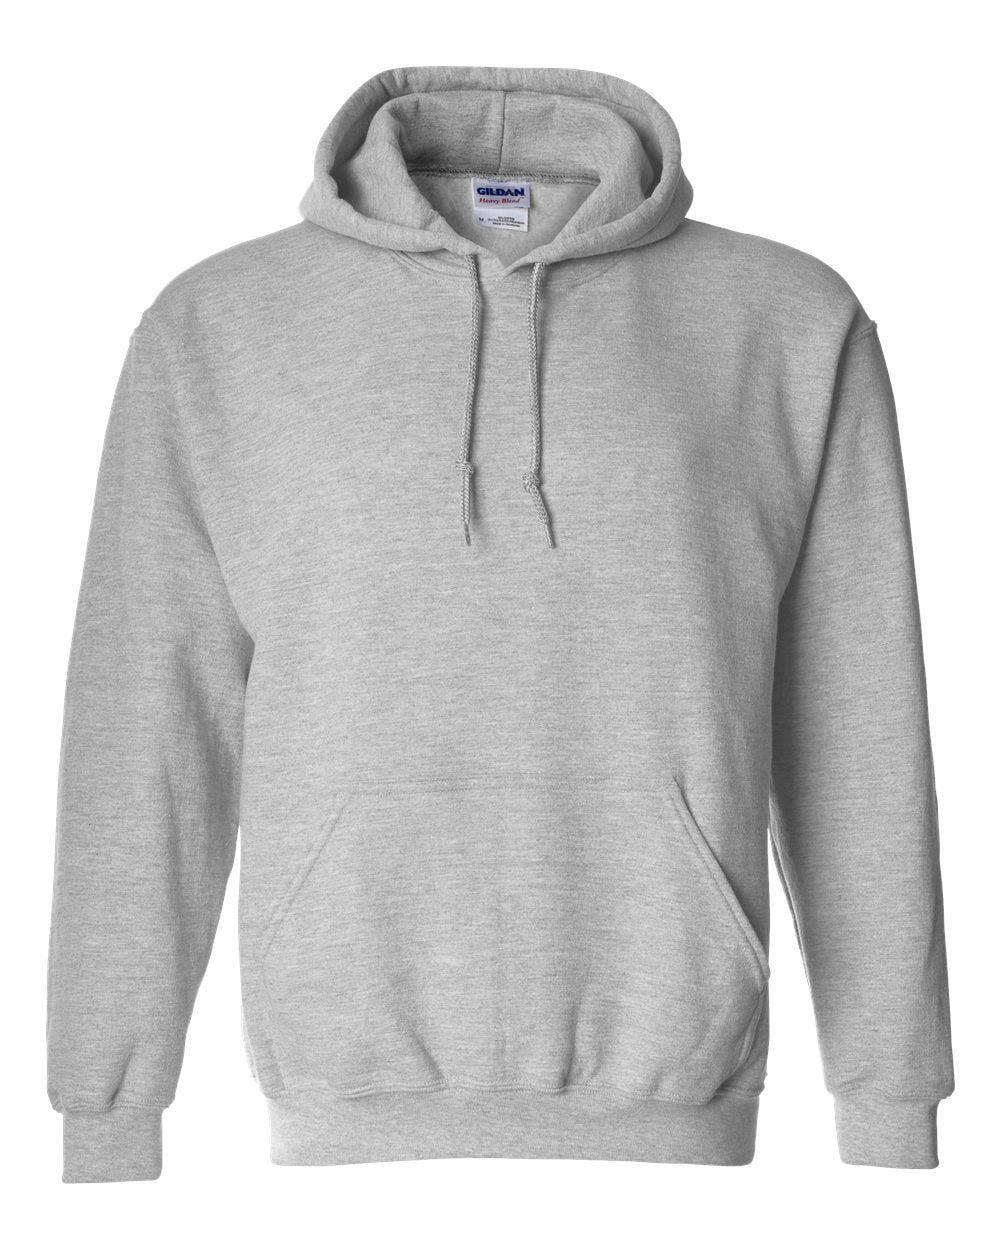 Sport Gray Blank Gildan Shirt Adult